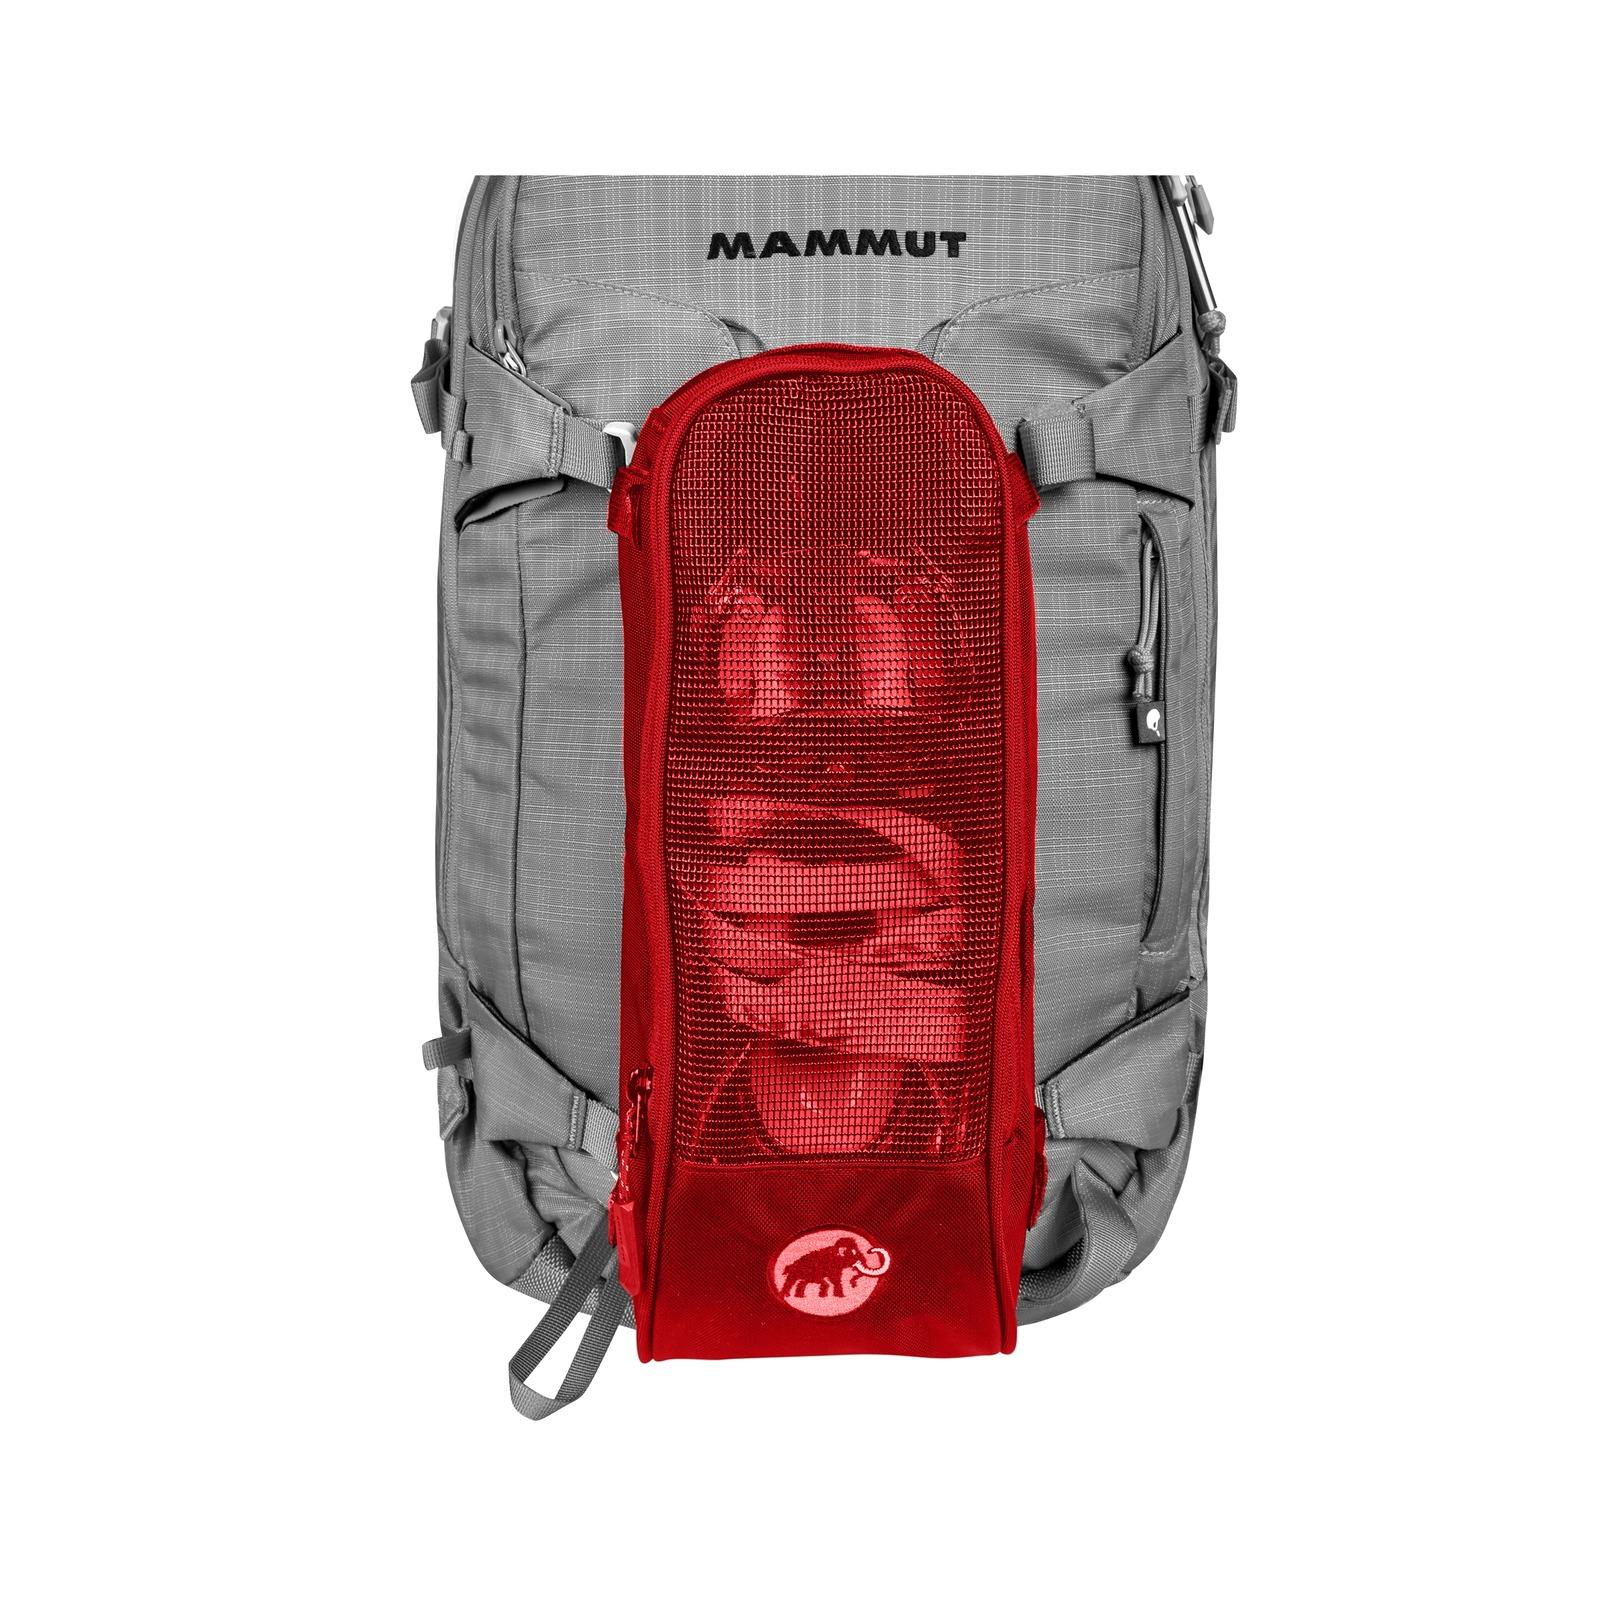 ride-protection-airbag-3-0-9_neutral_det_rgb_1600x1600.jpg